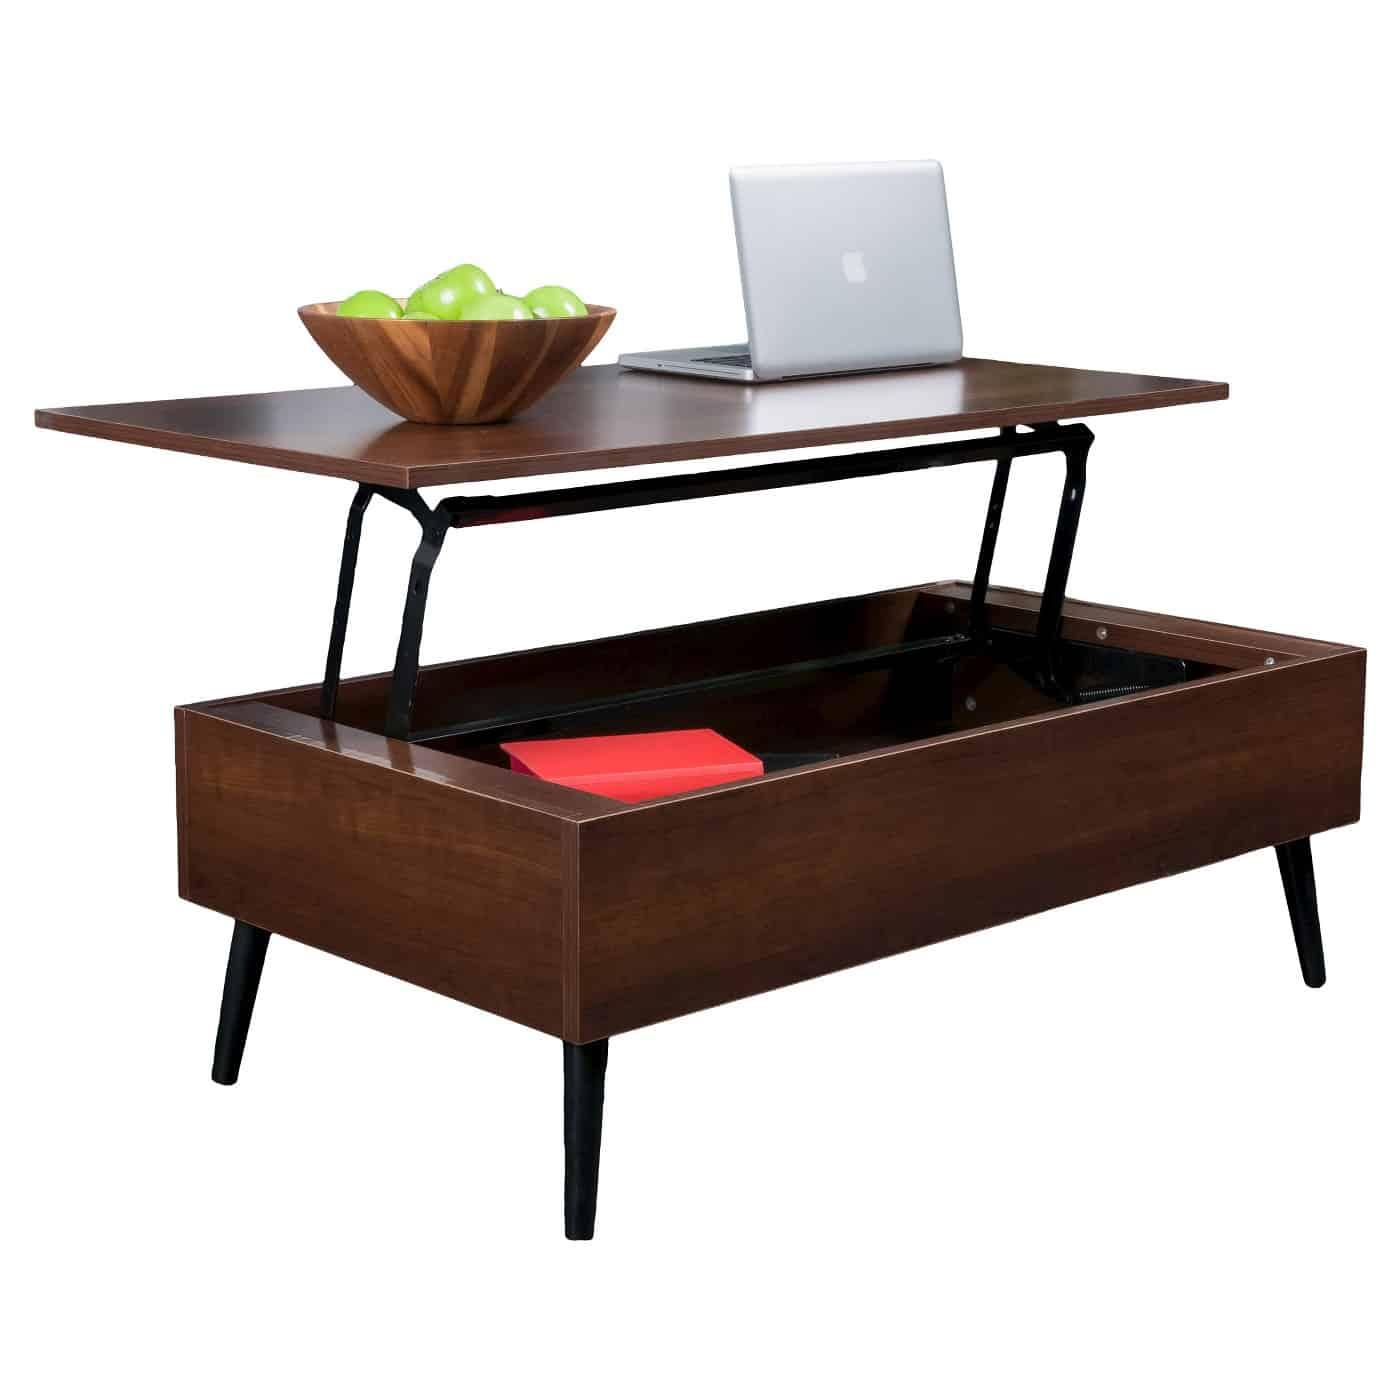 elliot wood lift top coffee table